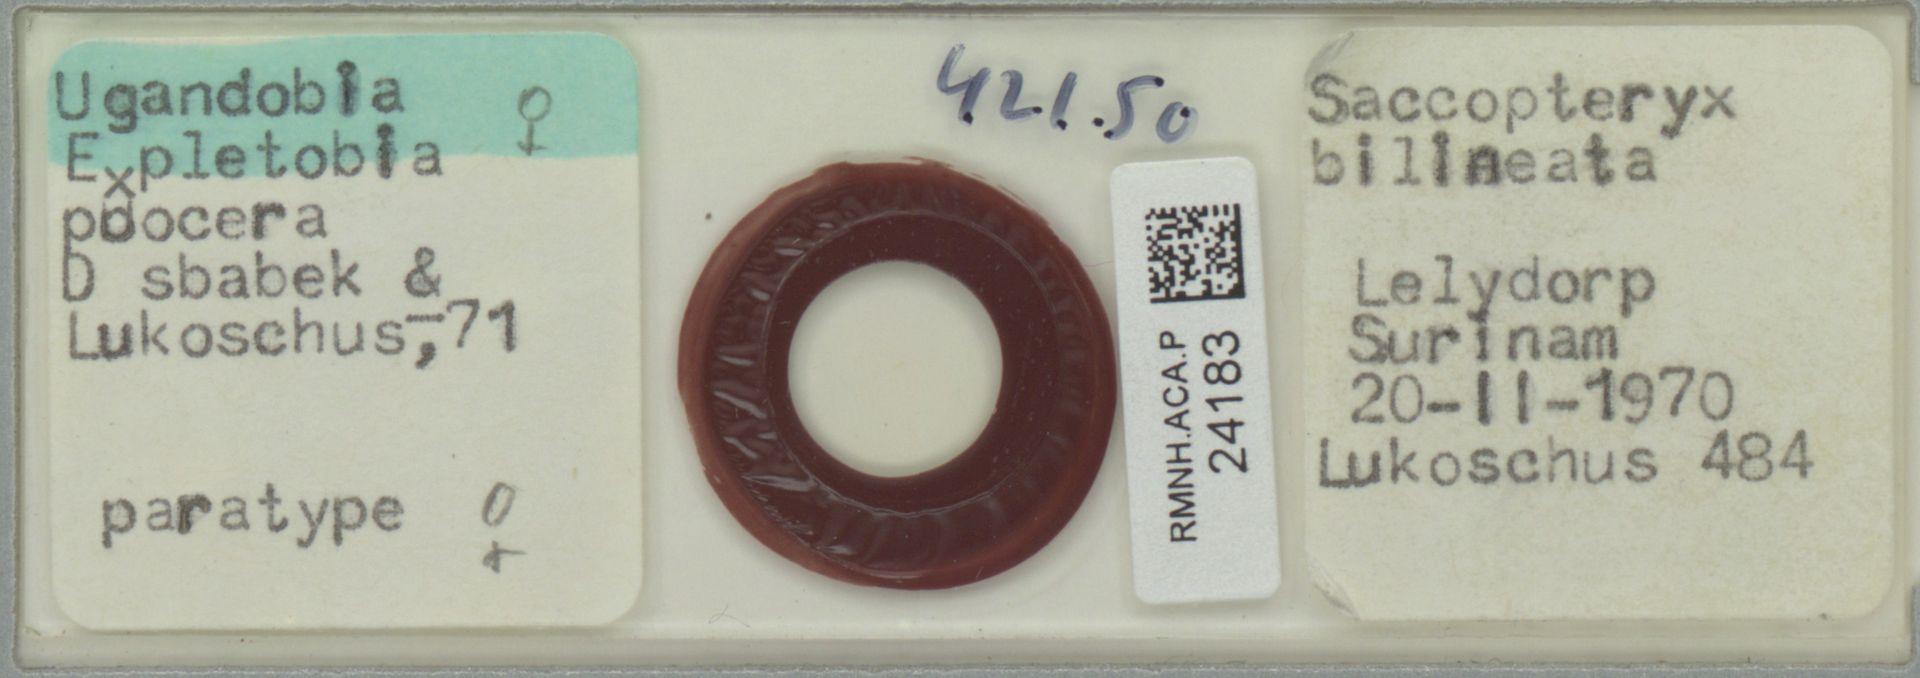 RMNH.ACA.P.24183 | Ugandobia (Expletobia) procera Dusbabek & Lukoschus 71